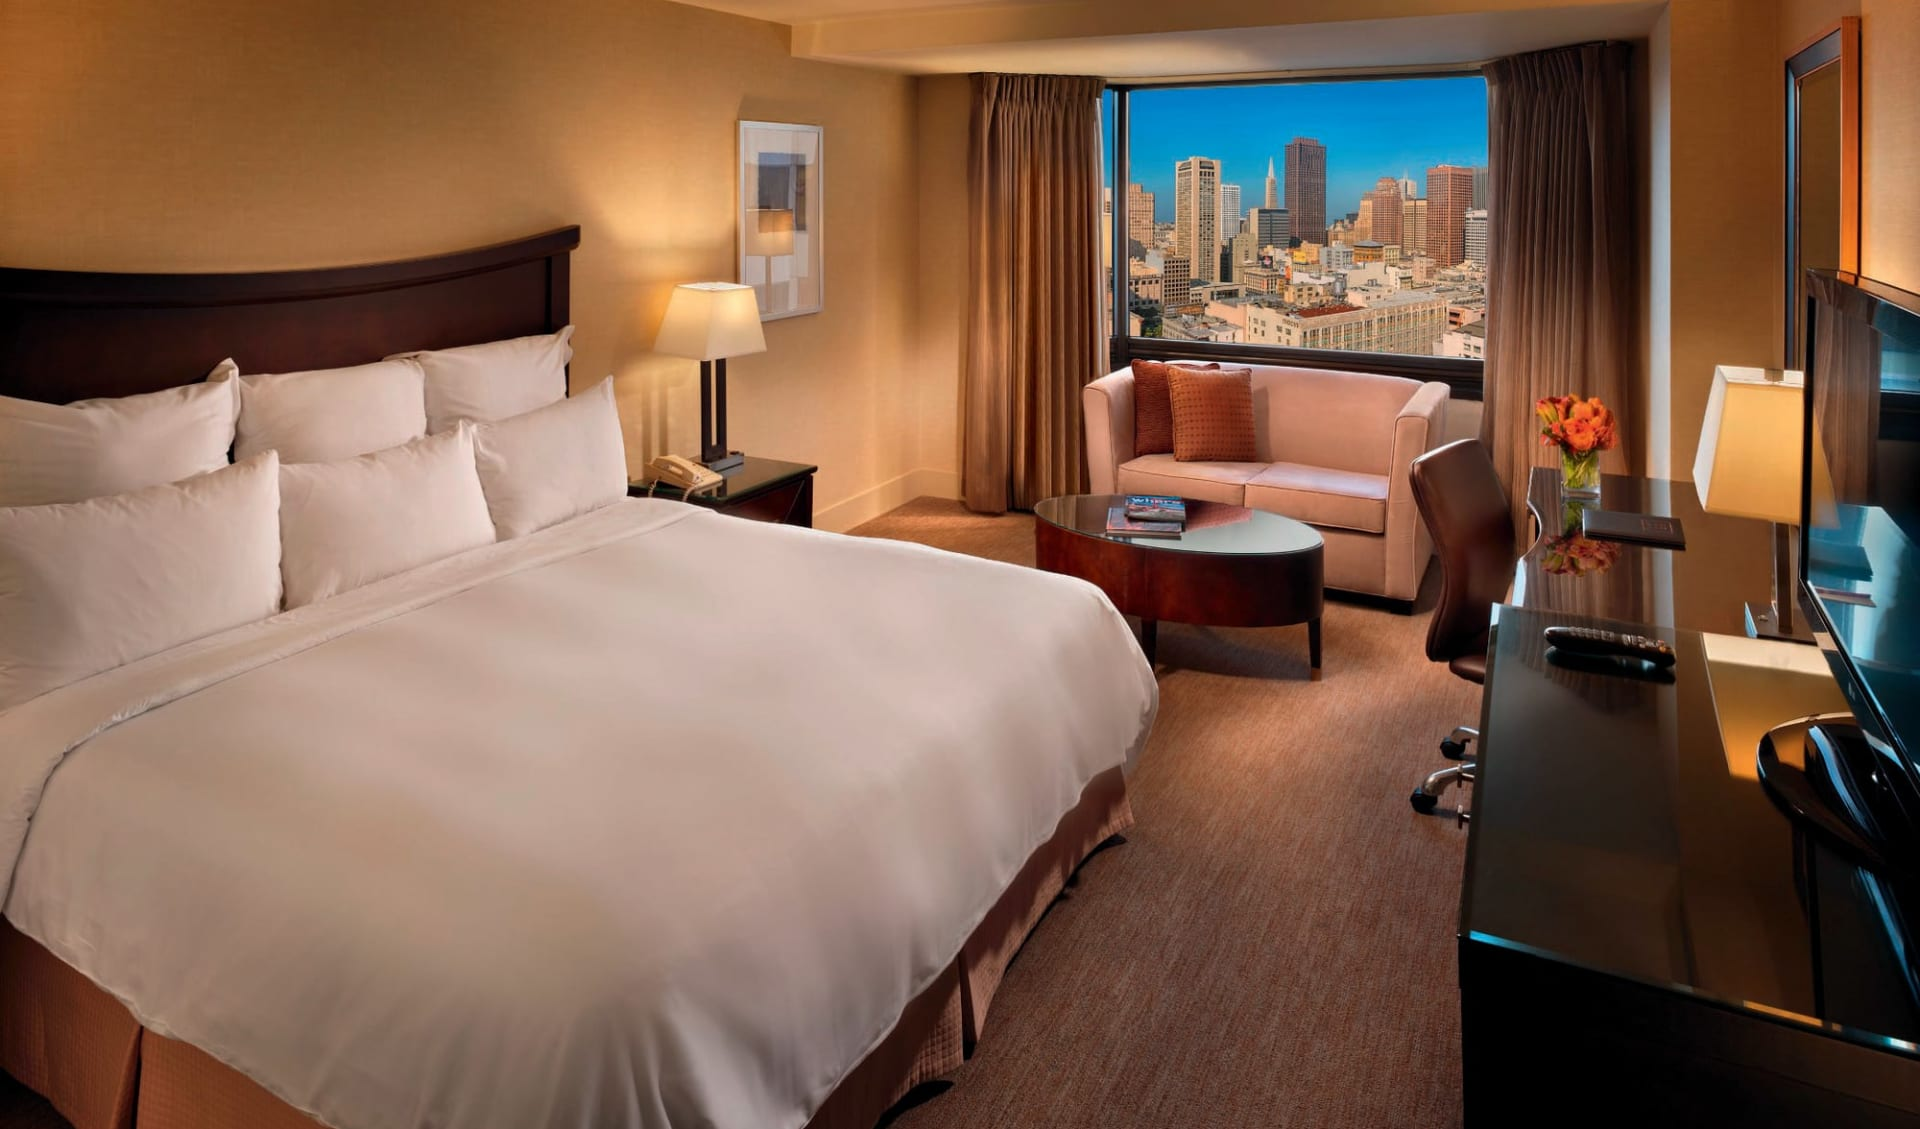 Parc 55 San Francisco: zimmer parc 55 san francisco a hilton hotel doppelzimmer